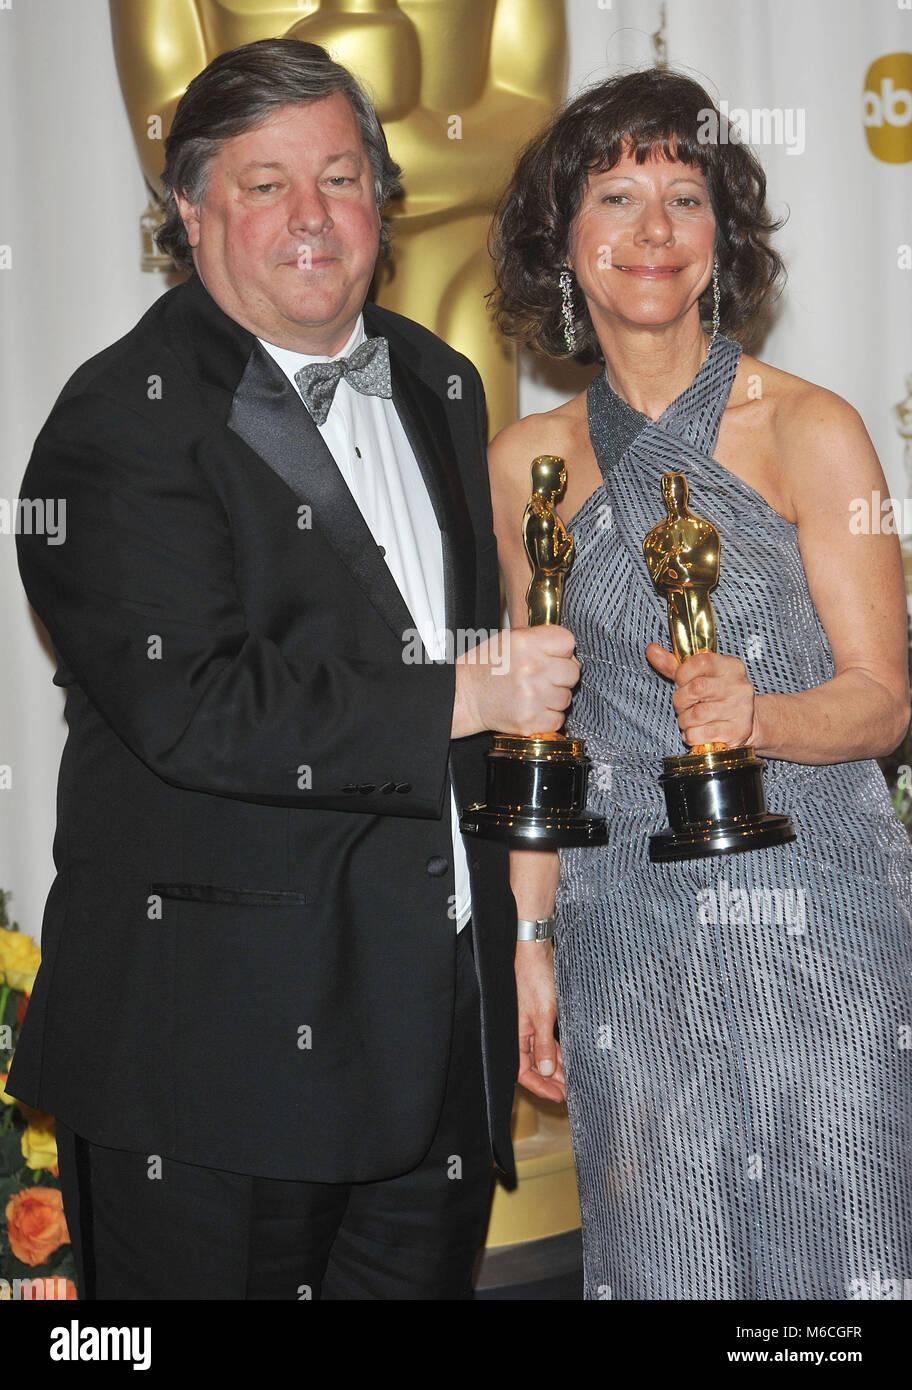 Kirk Simon  and Karen Goodman - Oscars  at the 83th Academy Awards at the Kodak Theatre In Los Angeles.Kirk Simon - Stock Image